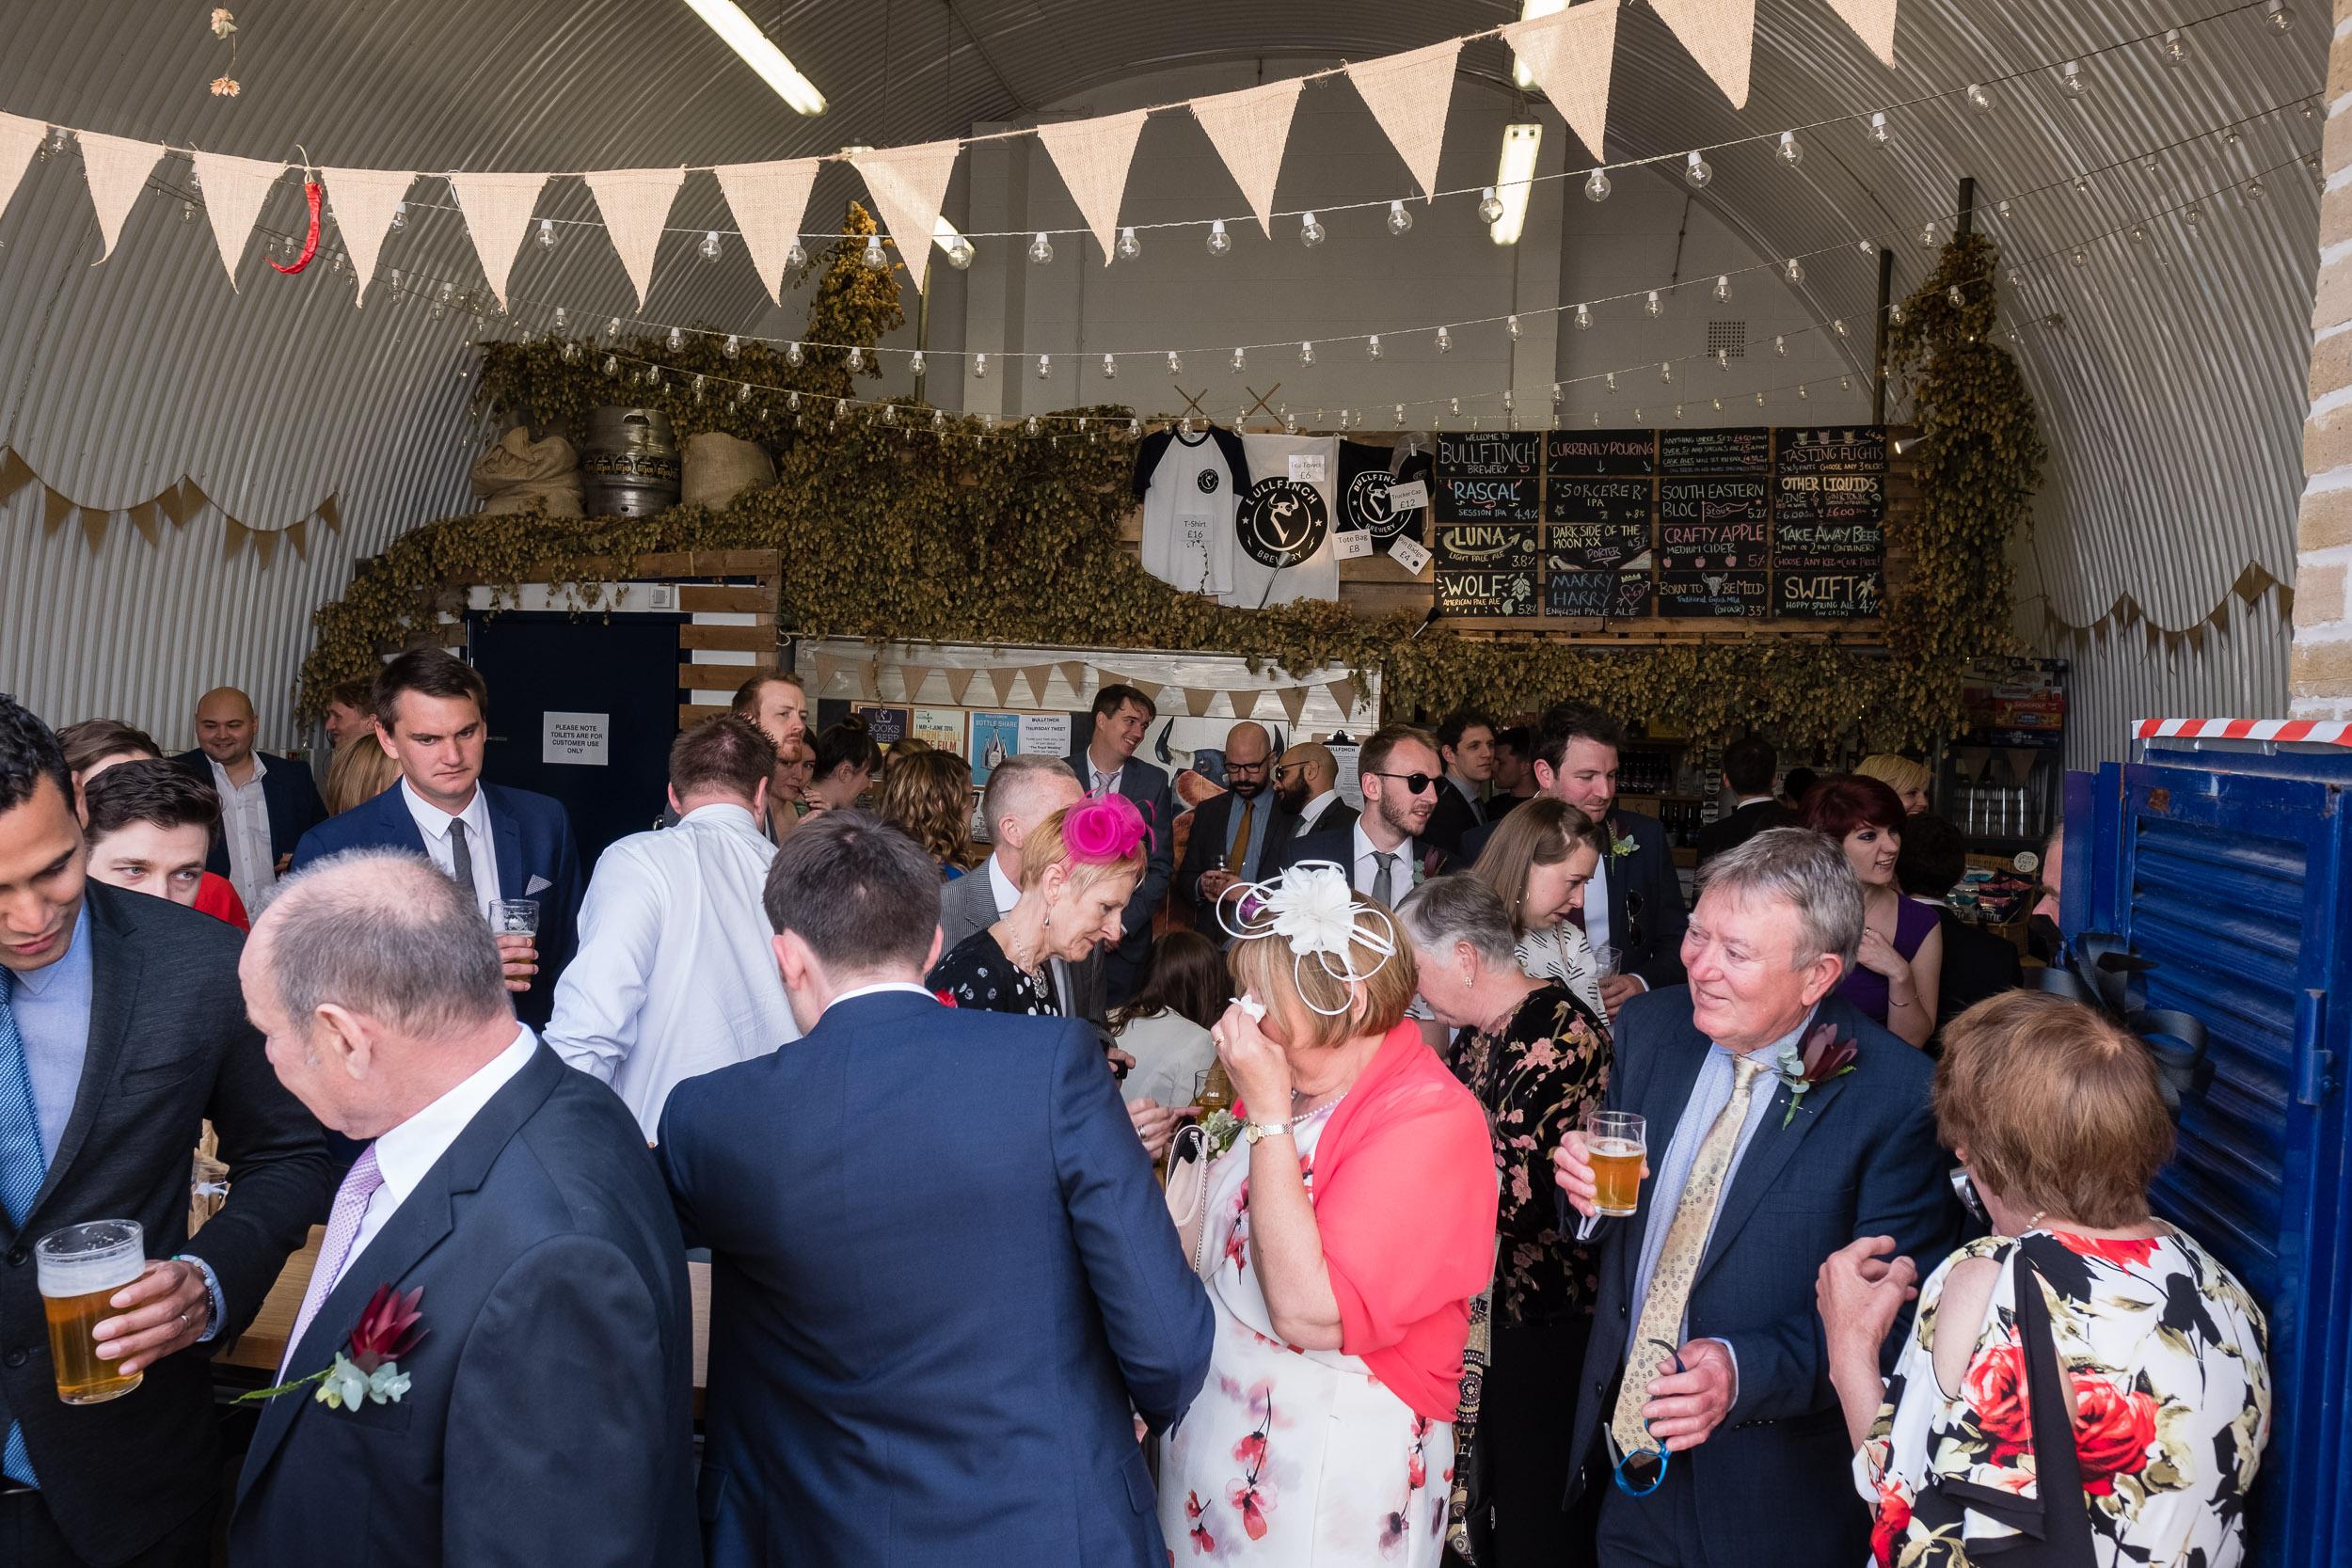 brockwell-lido-brixton-herne-hill-wedding-054.jpg